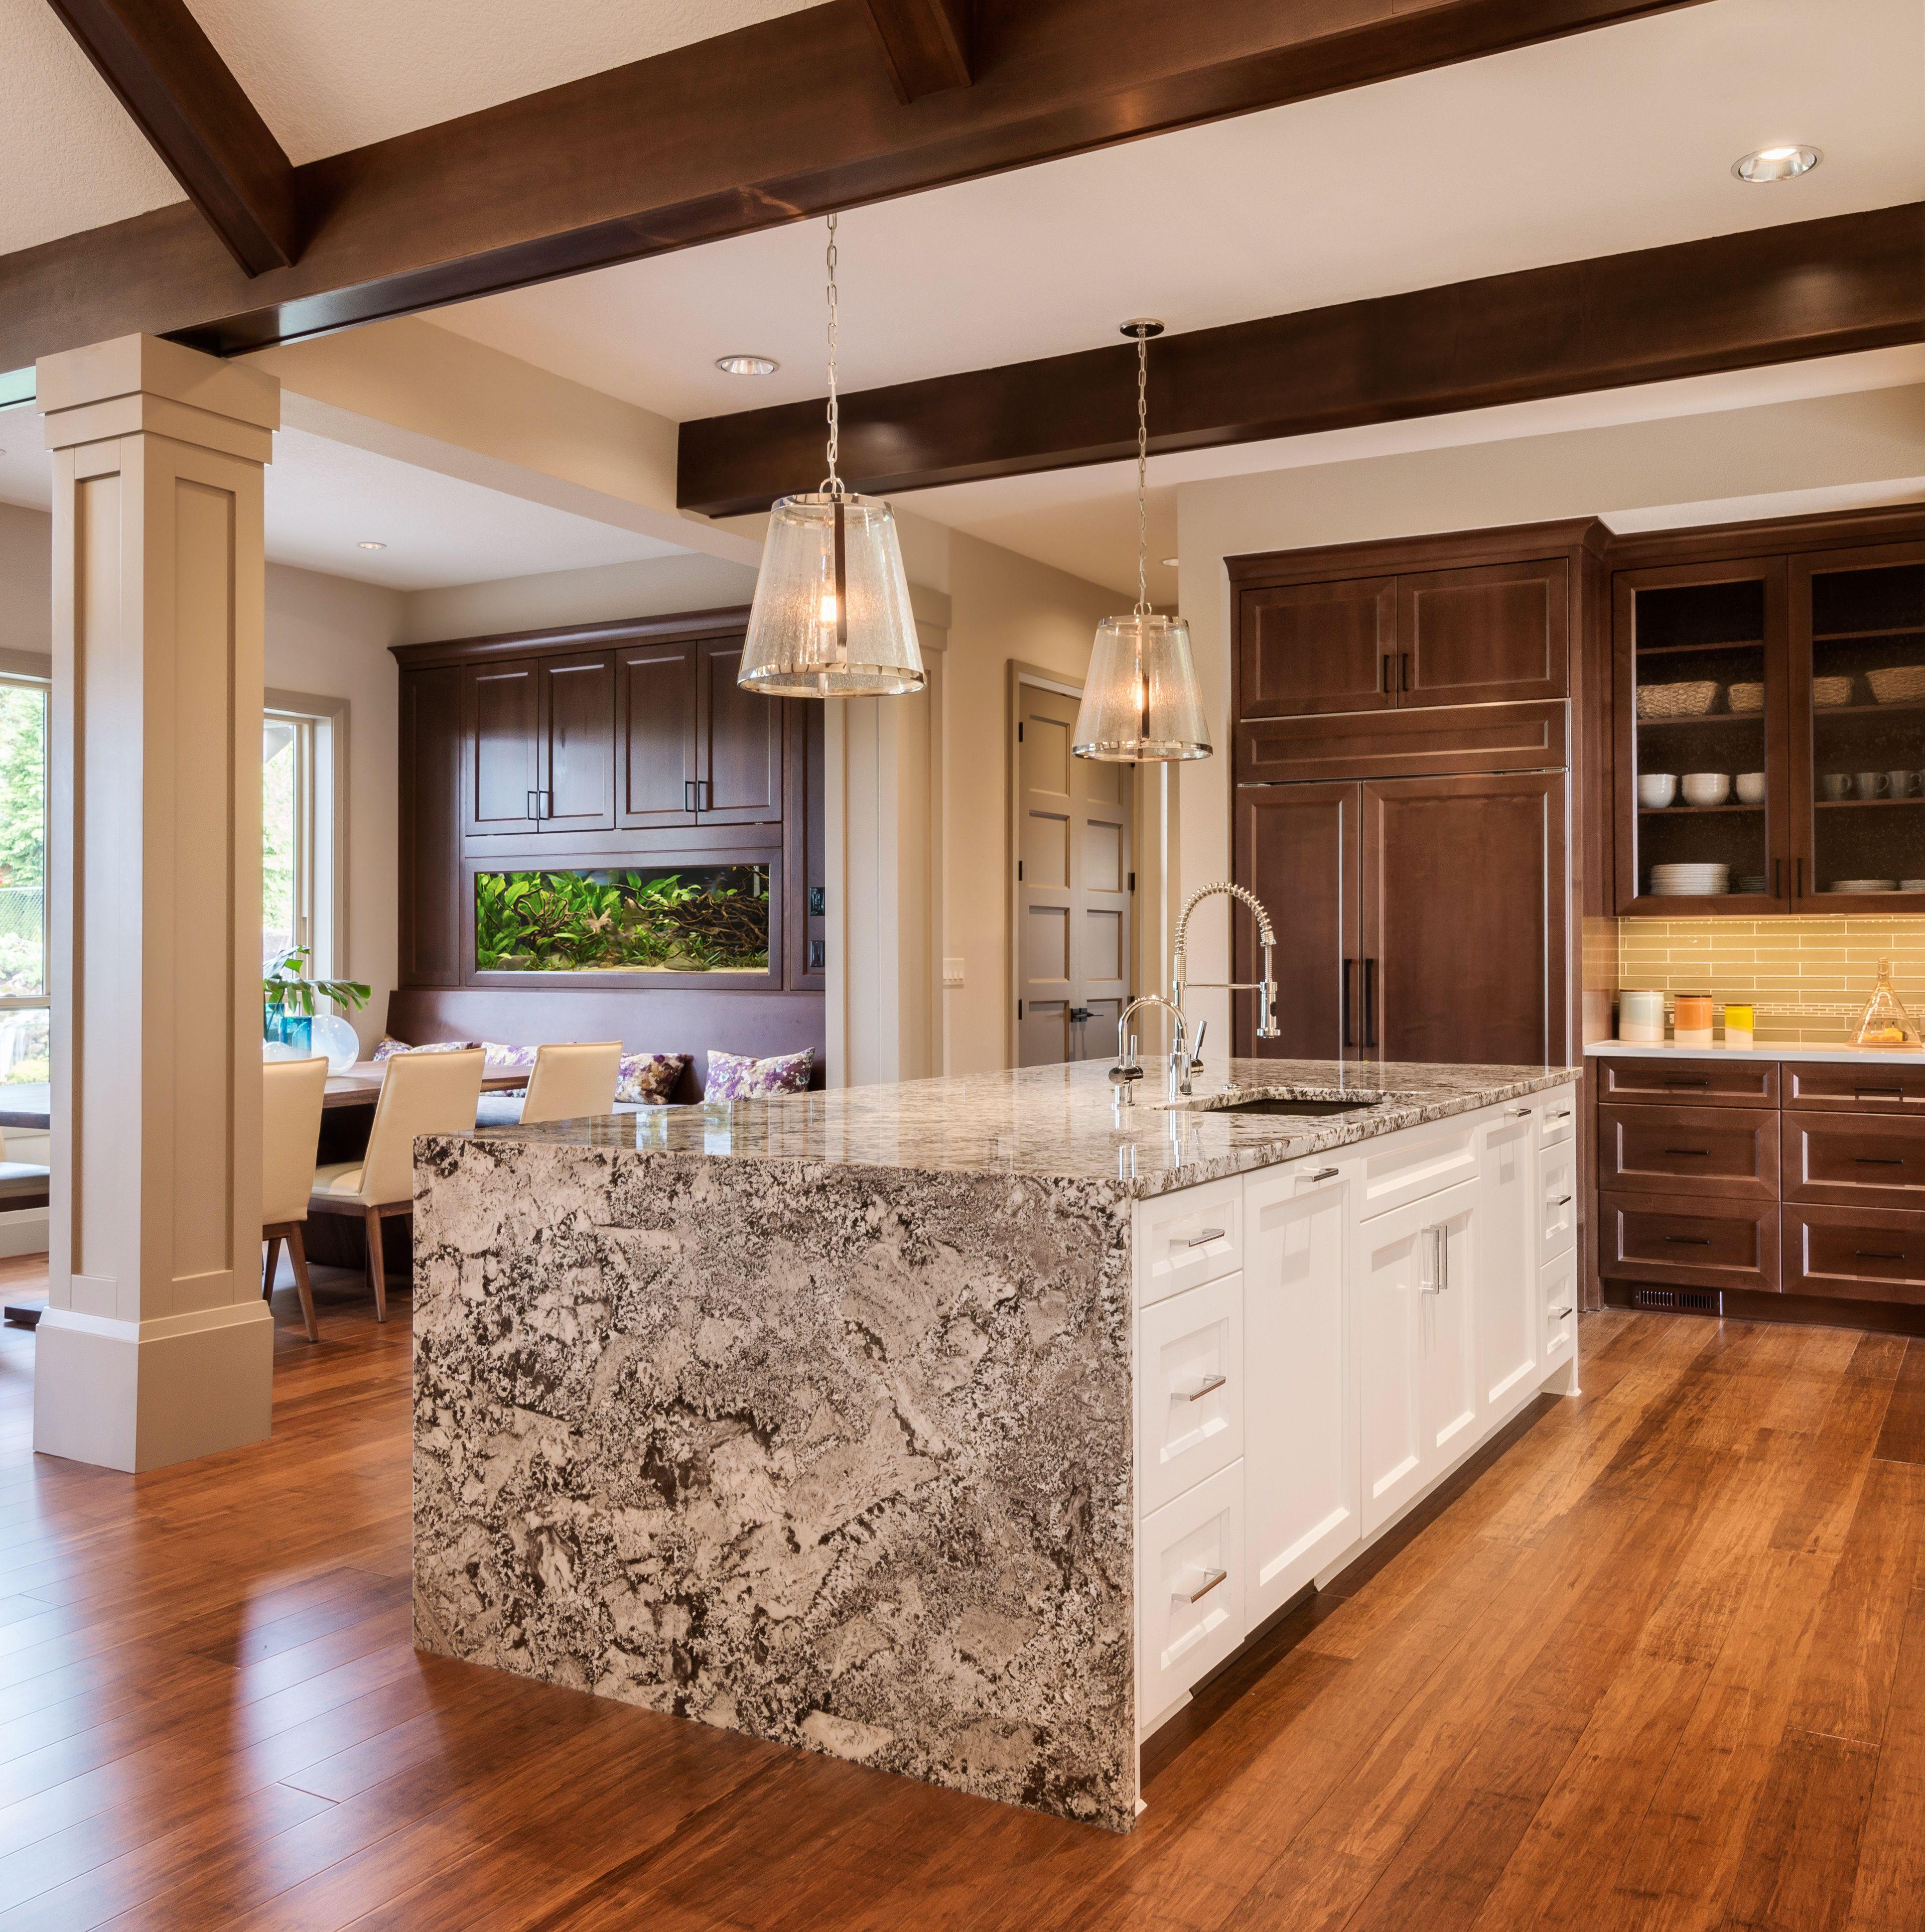 Piekna Drewniana Otwarta Kuchnia Z Jadalnia Szafki Kuchenne W Kolorze Ciemnego Brazu Obecna Wyspa K Clean Quartz Countertops Kitchen Design Granite Kitchen